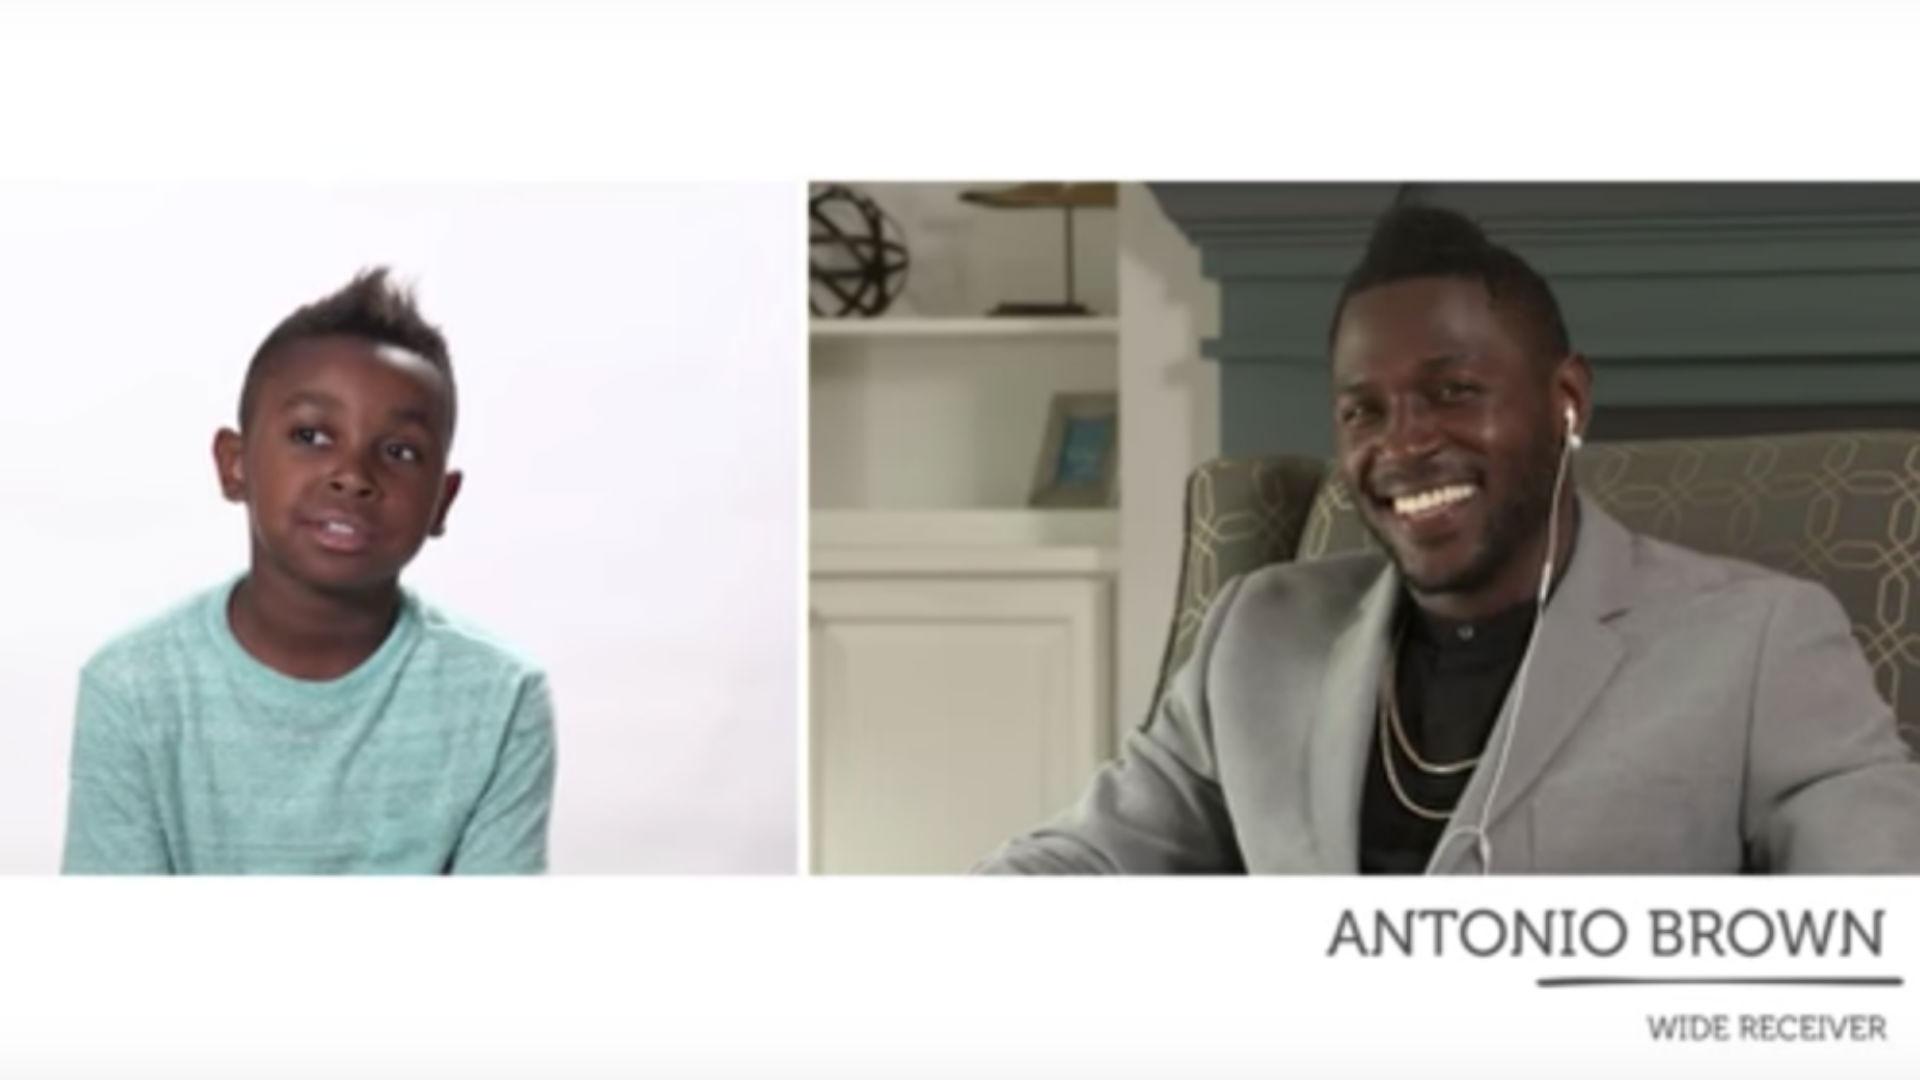 Antonio-brown-061416-youtube-ftrjpg_g881rl9dd1kx1hcctmt1s9iro